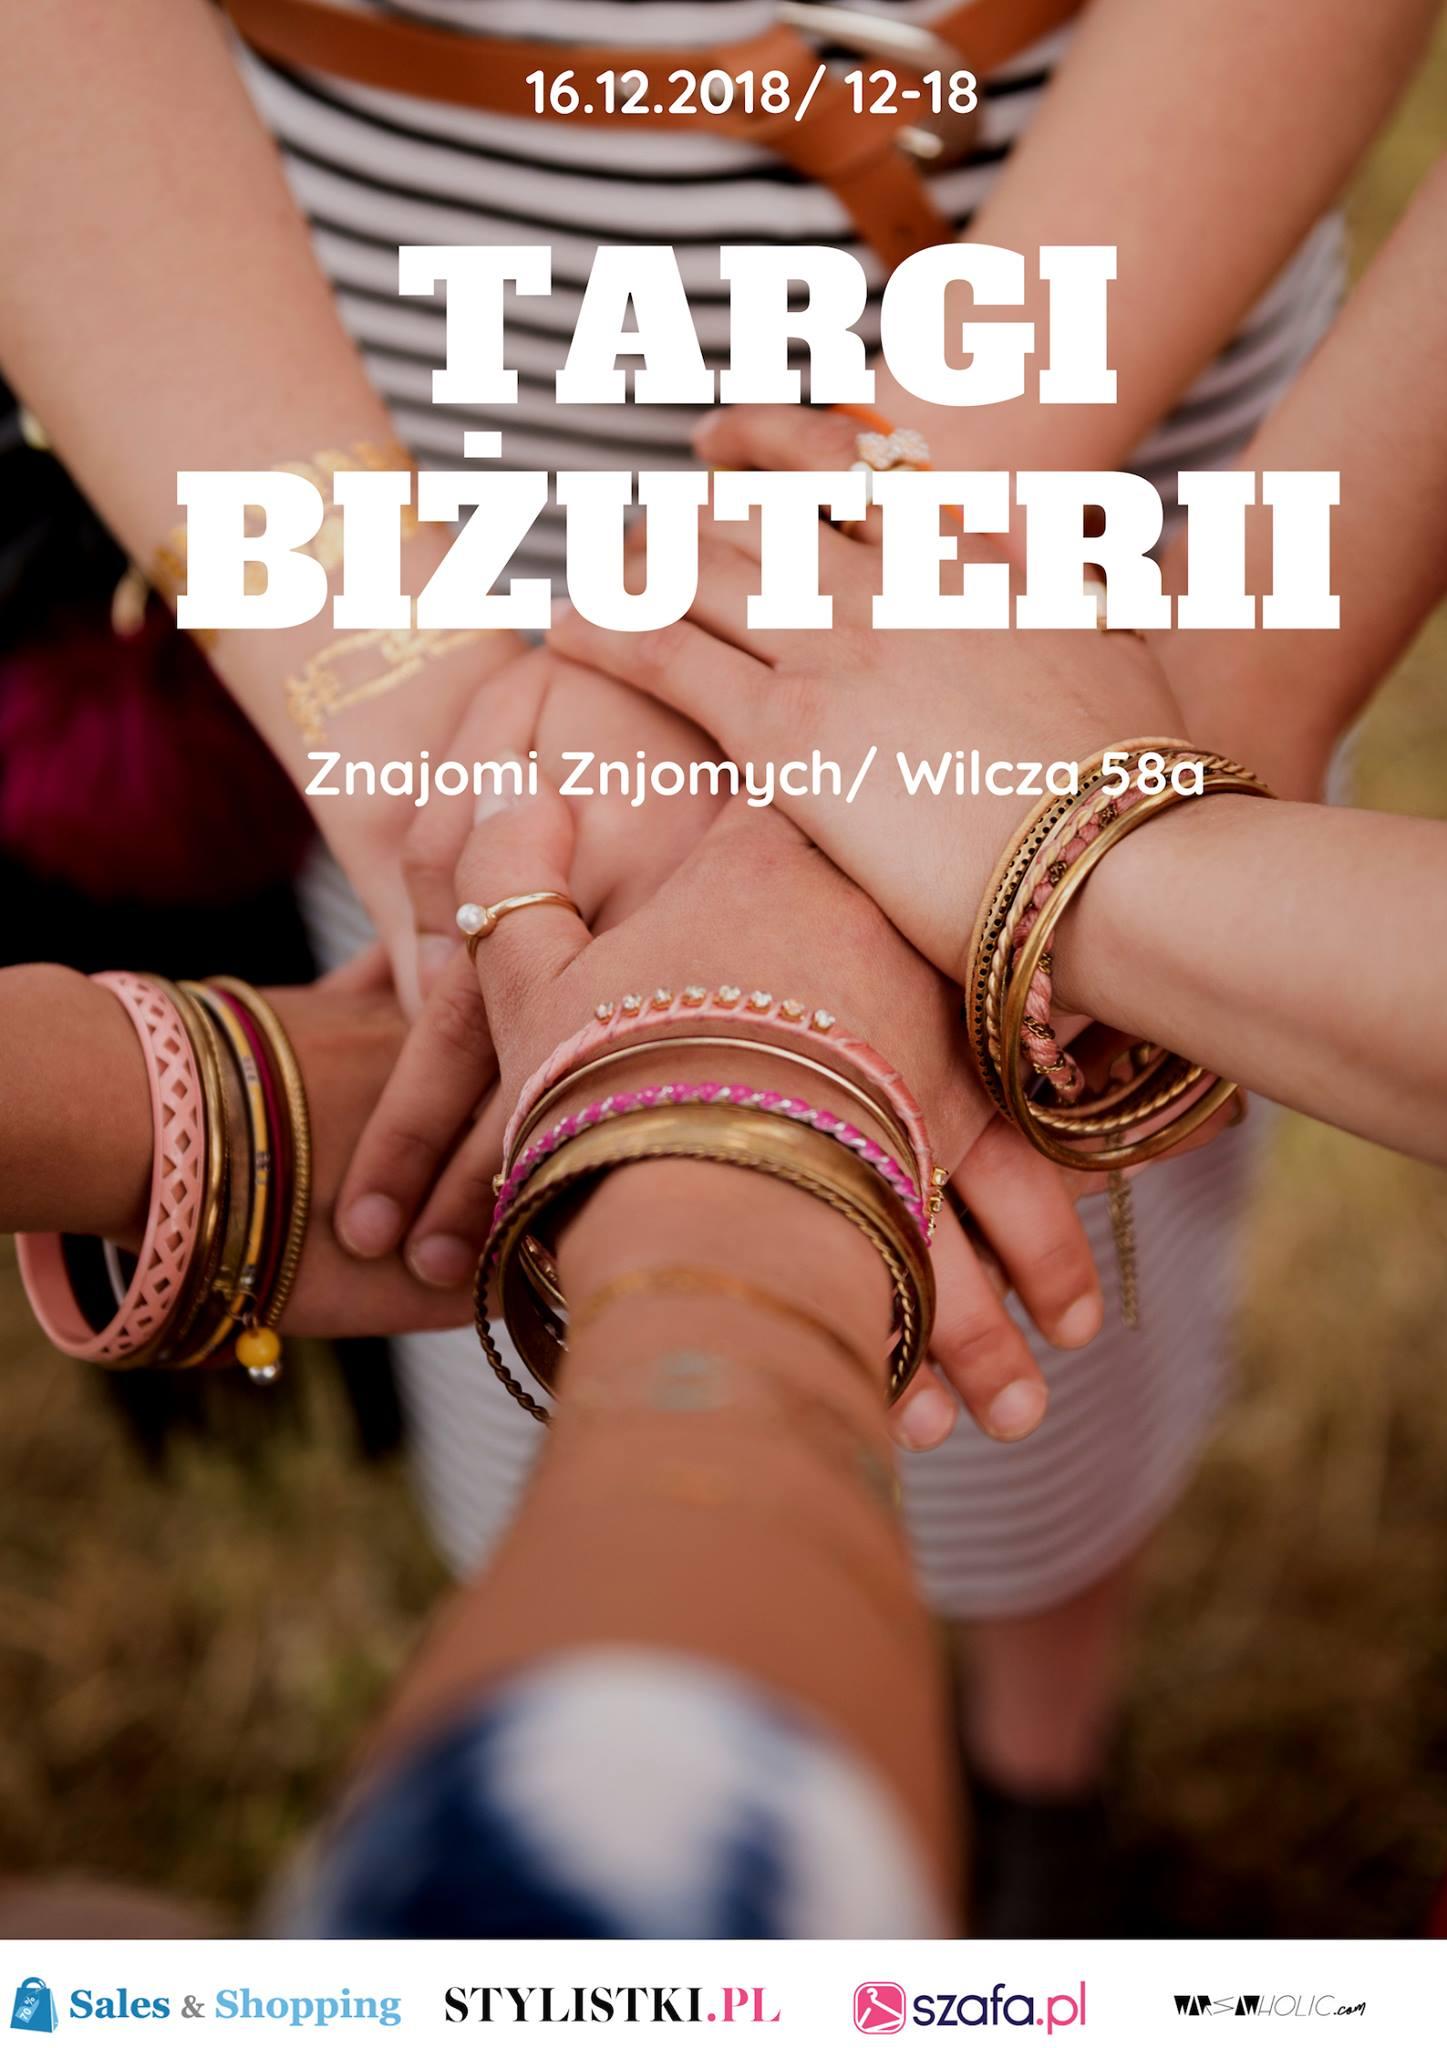 Targi Biżuterii w Warszawie 16 grudnia 2018                         title=